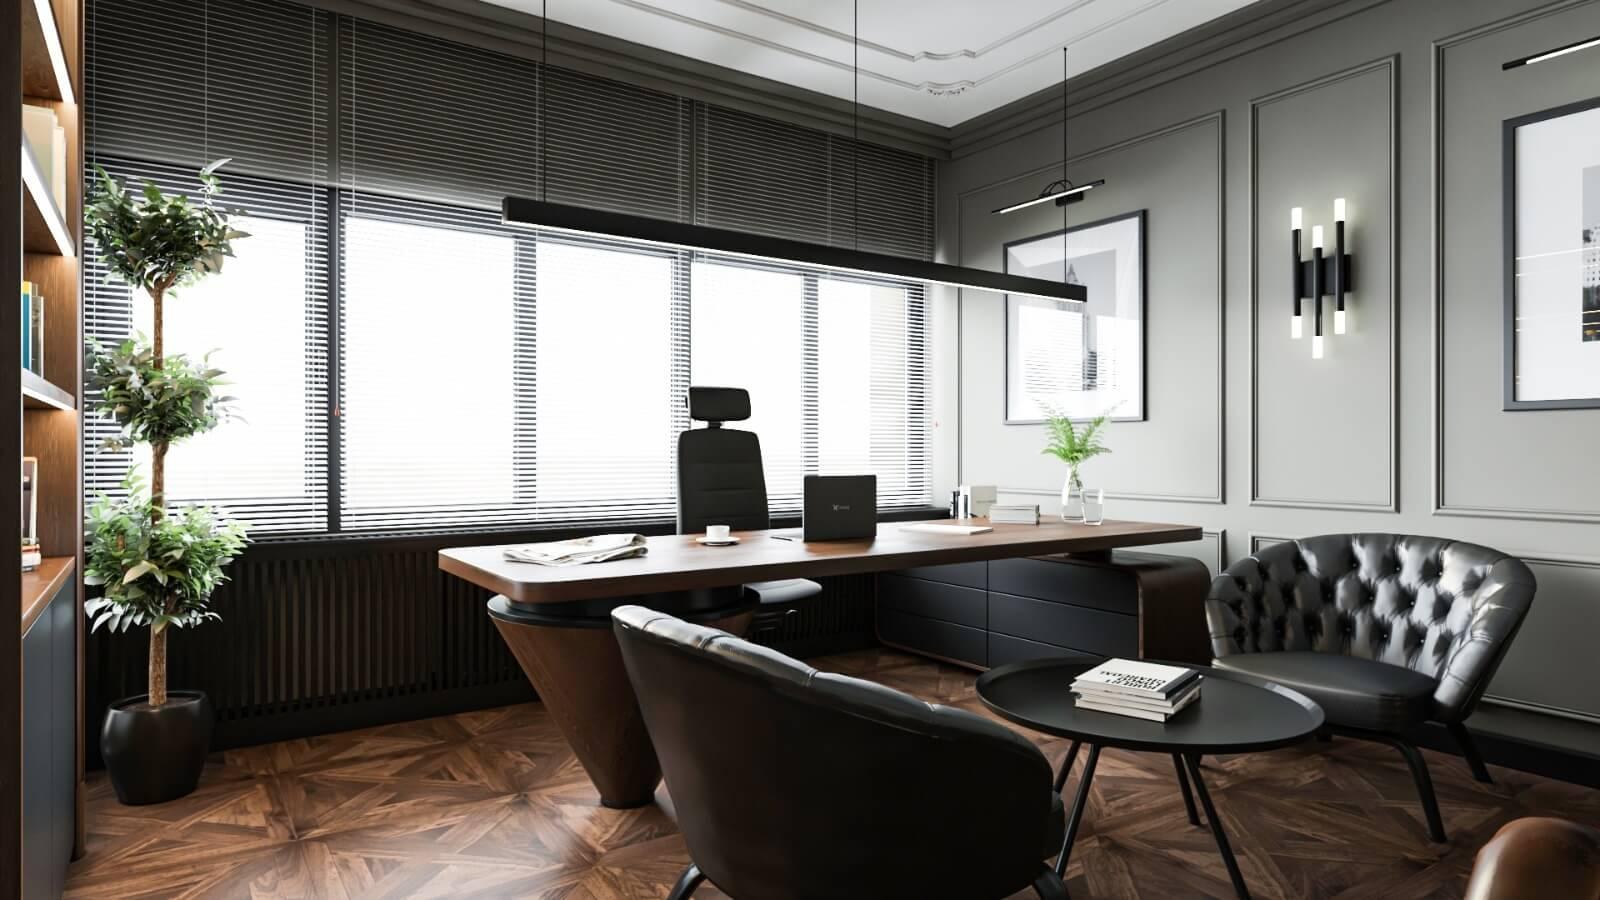 ofis mimari 4036 Başak AKGÜN Hukuk Ofisler